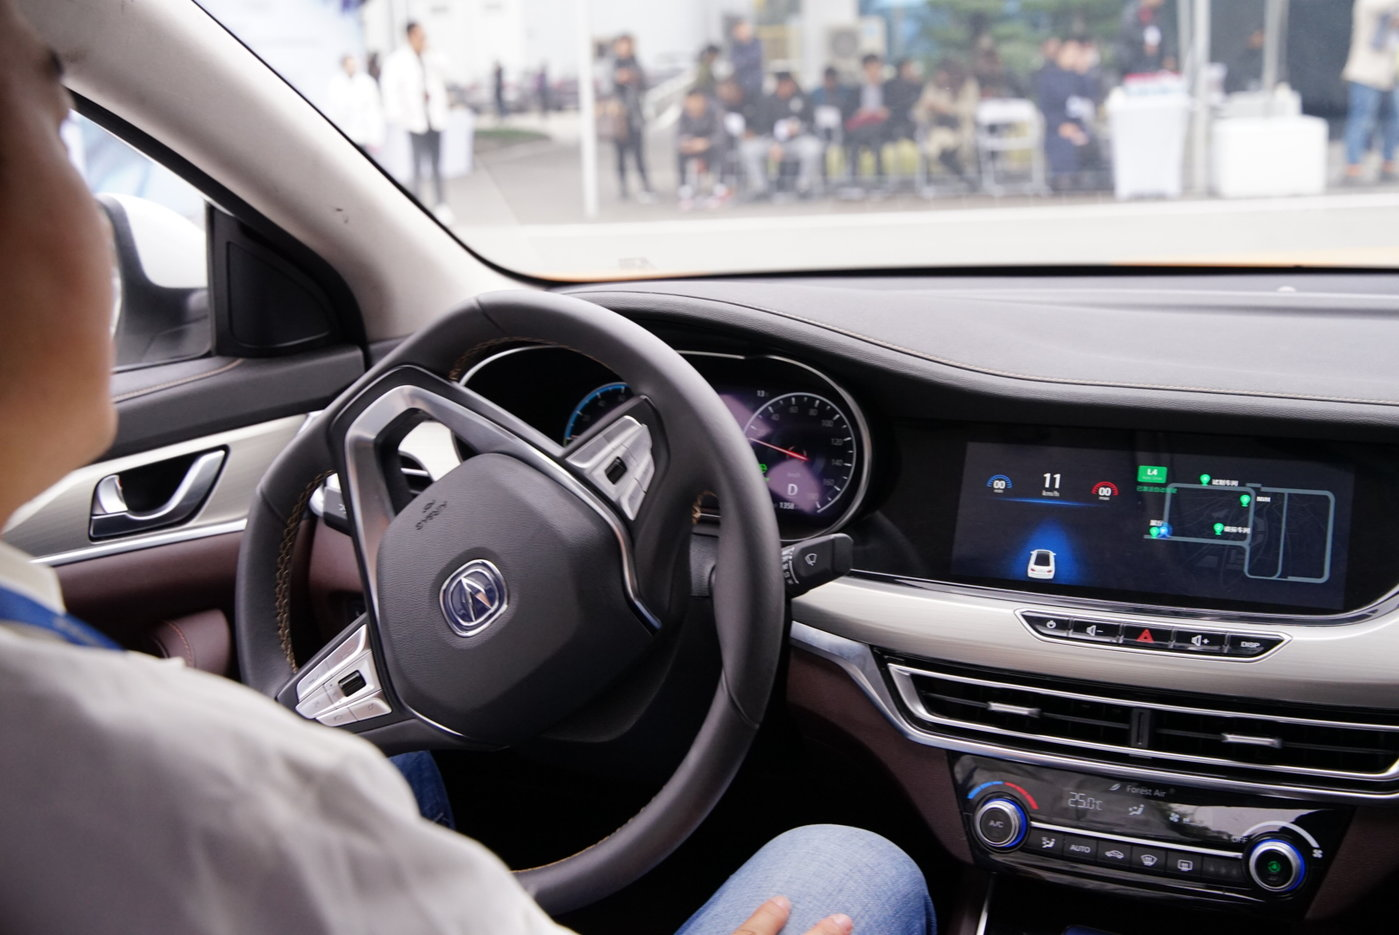 L4级自动驾驶可以满足街道行驶的需求,转弯等操作也无需人为操作